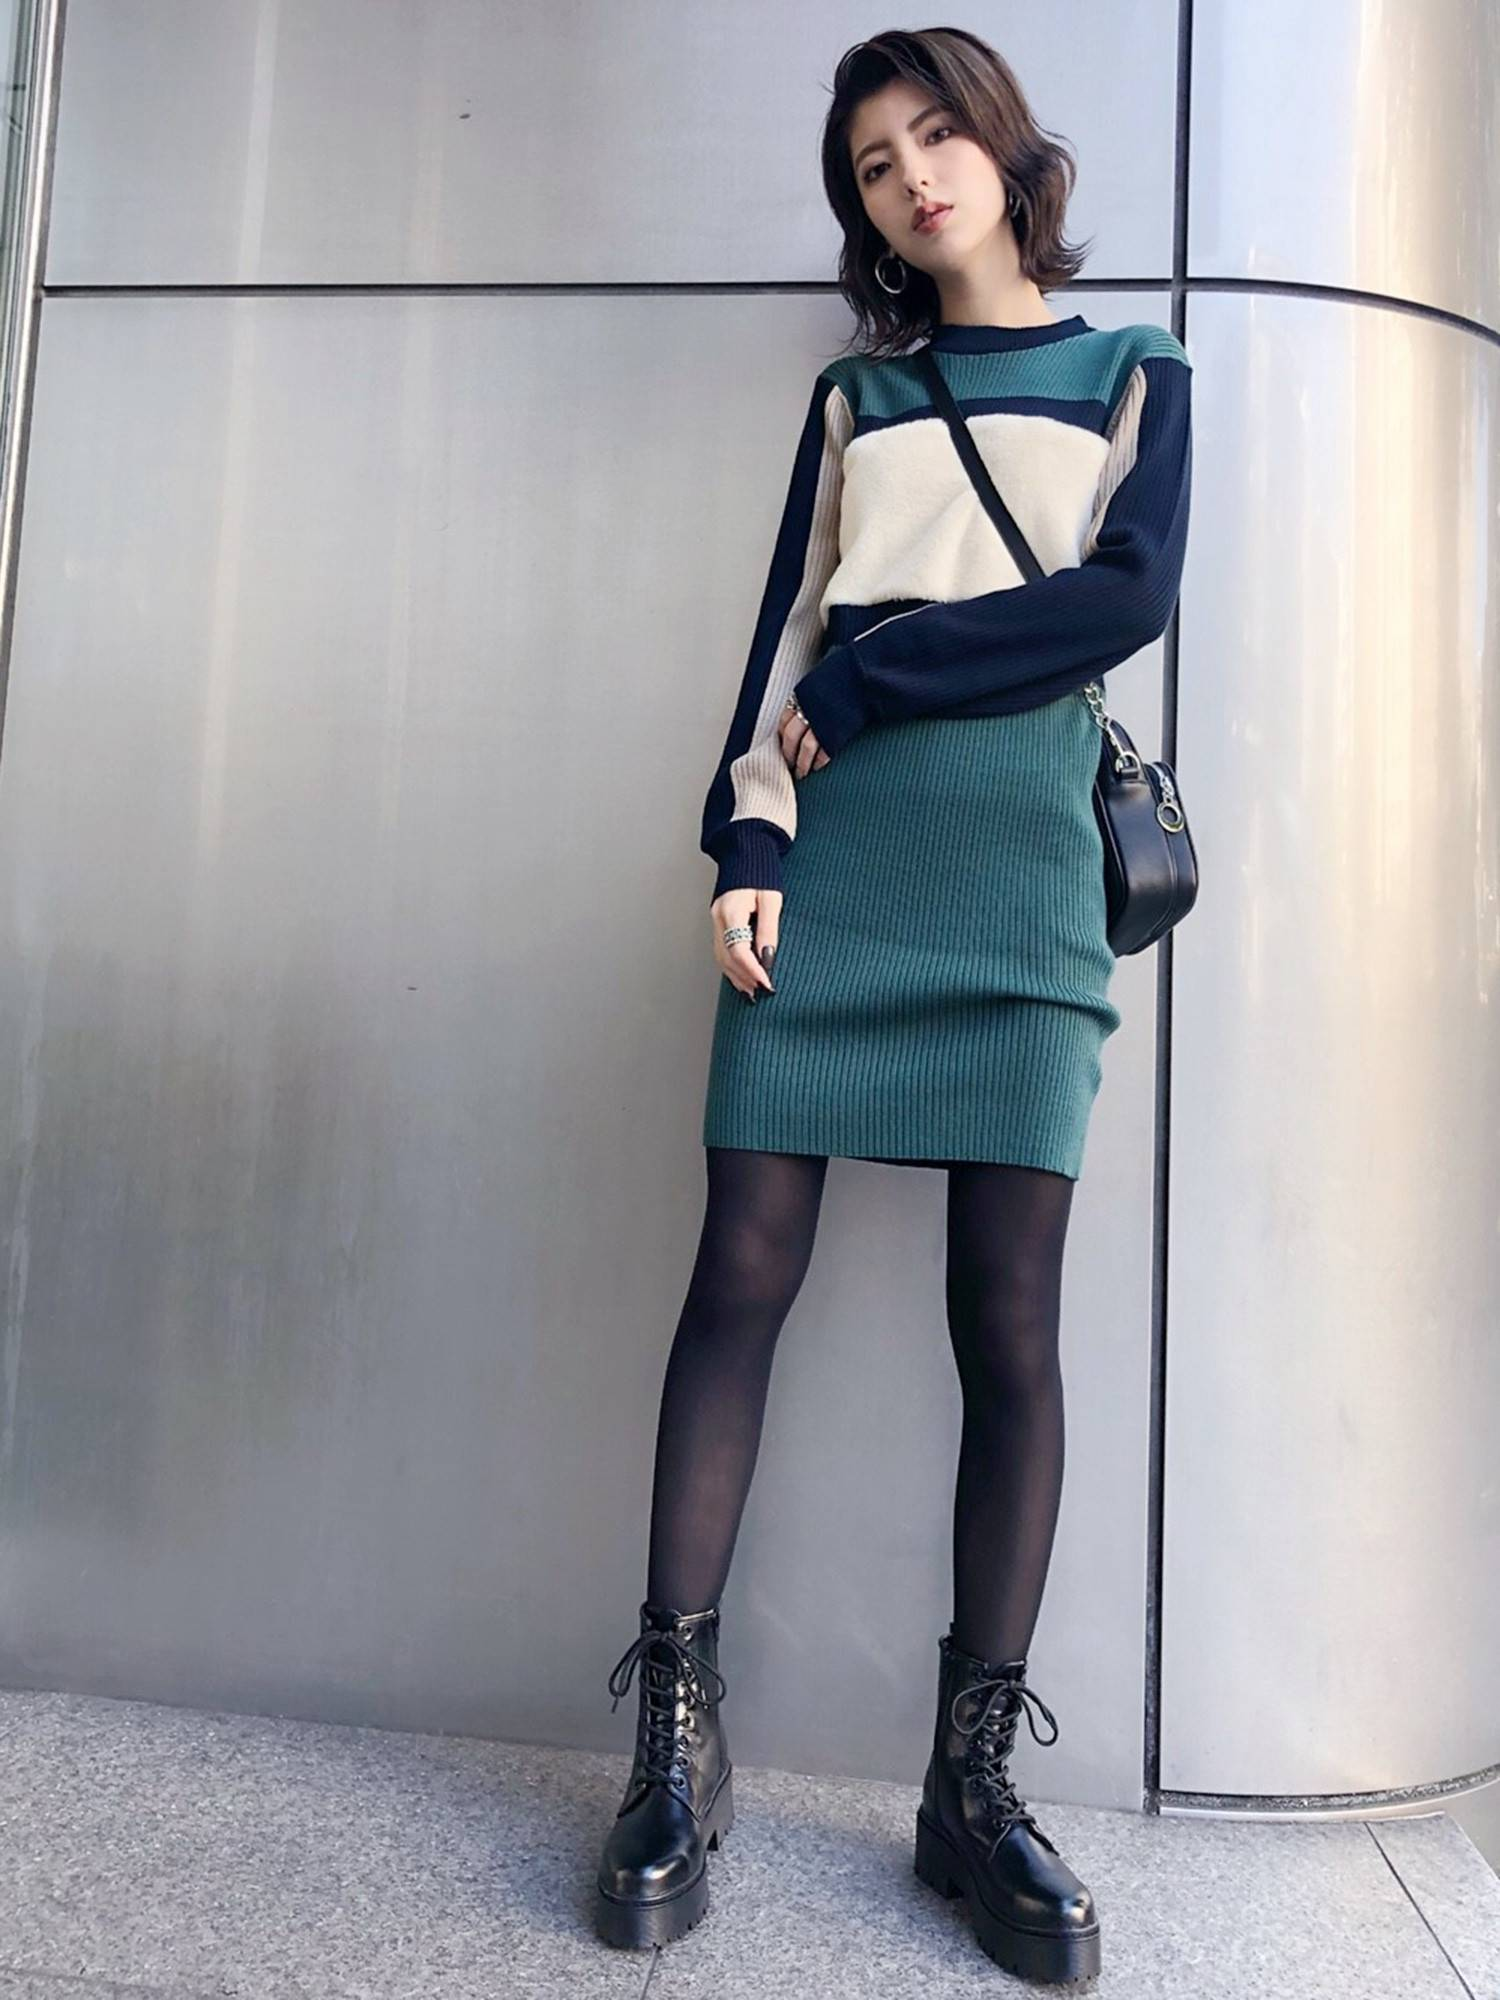 Shaggy combination knit dress